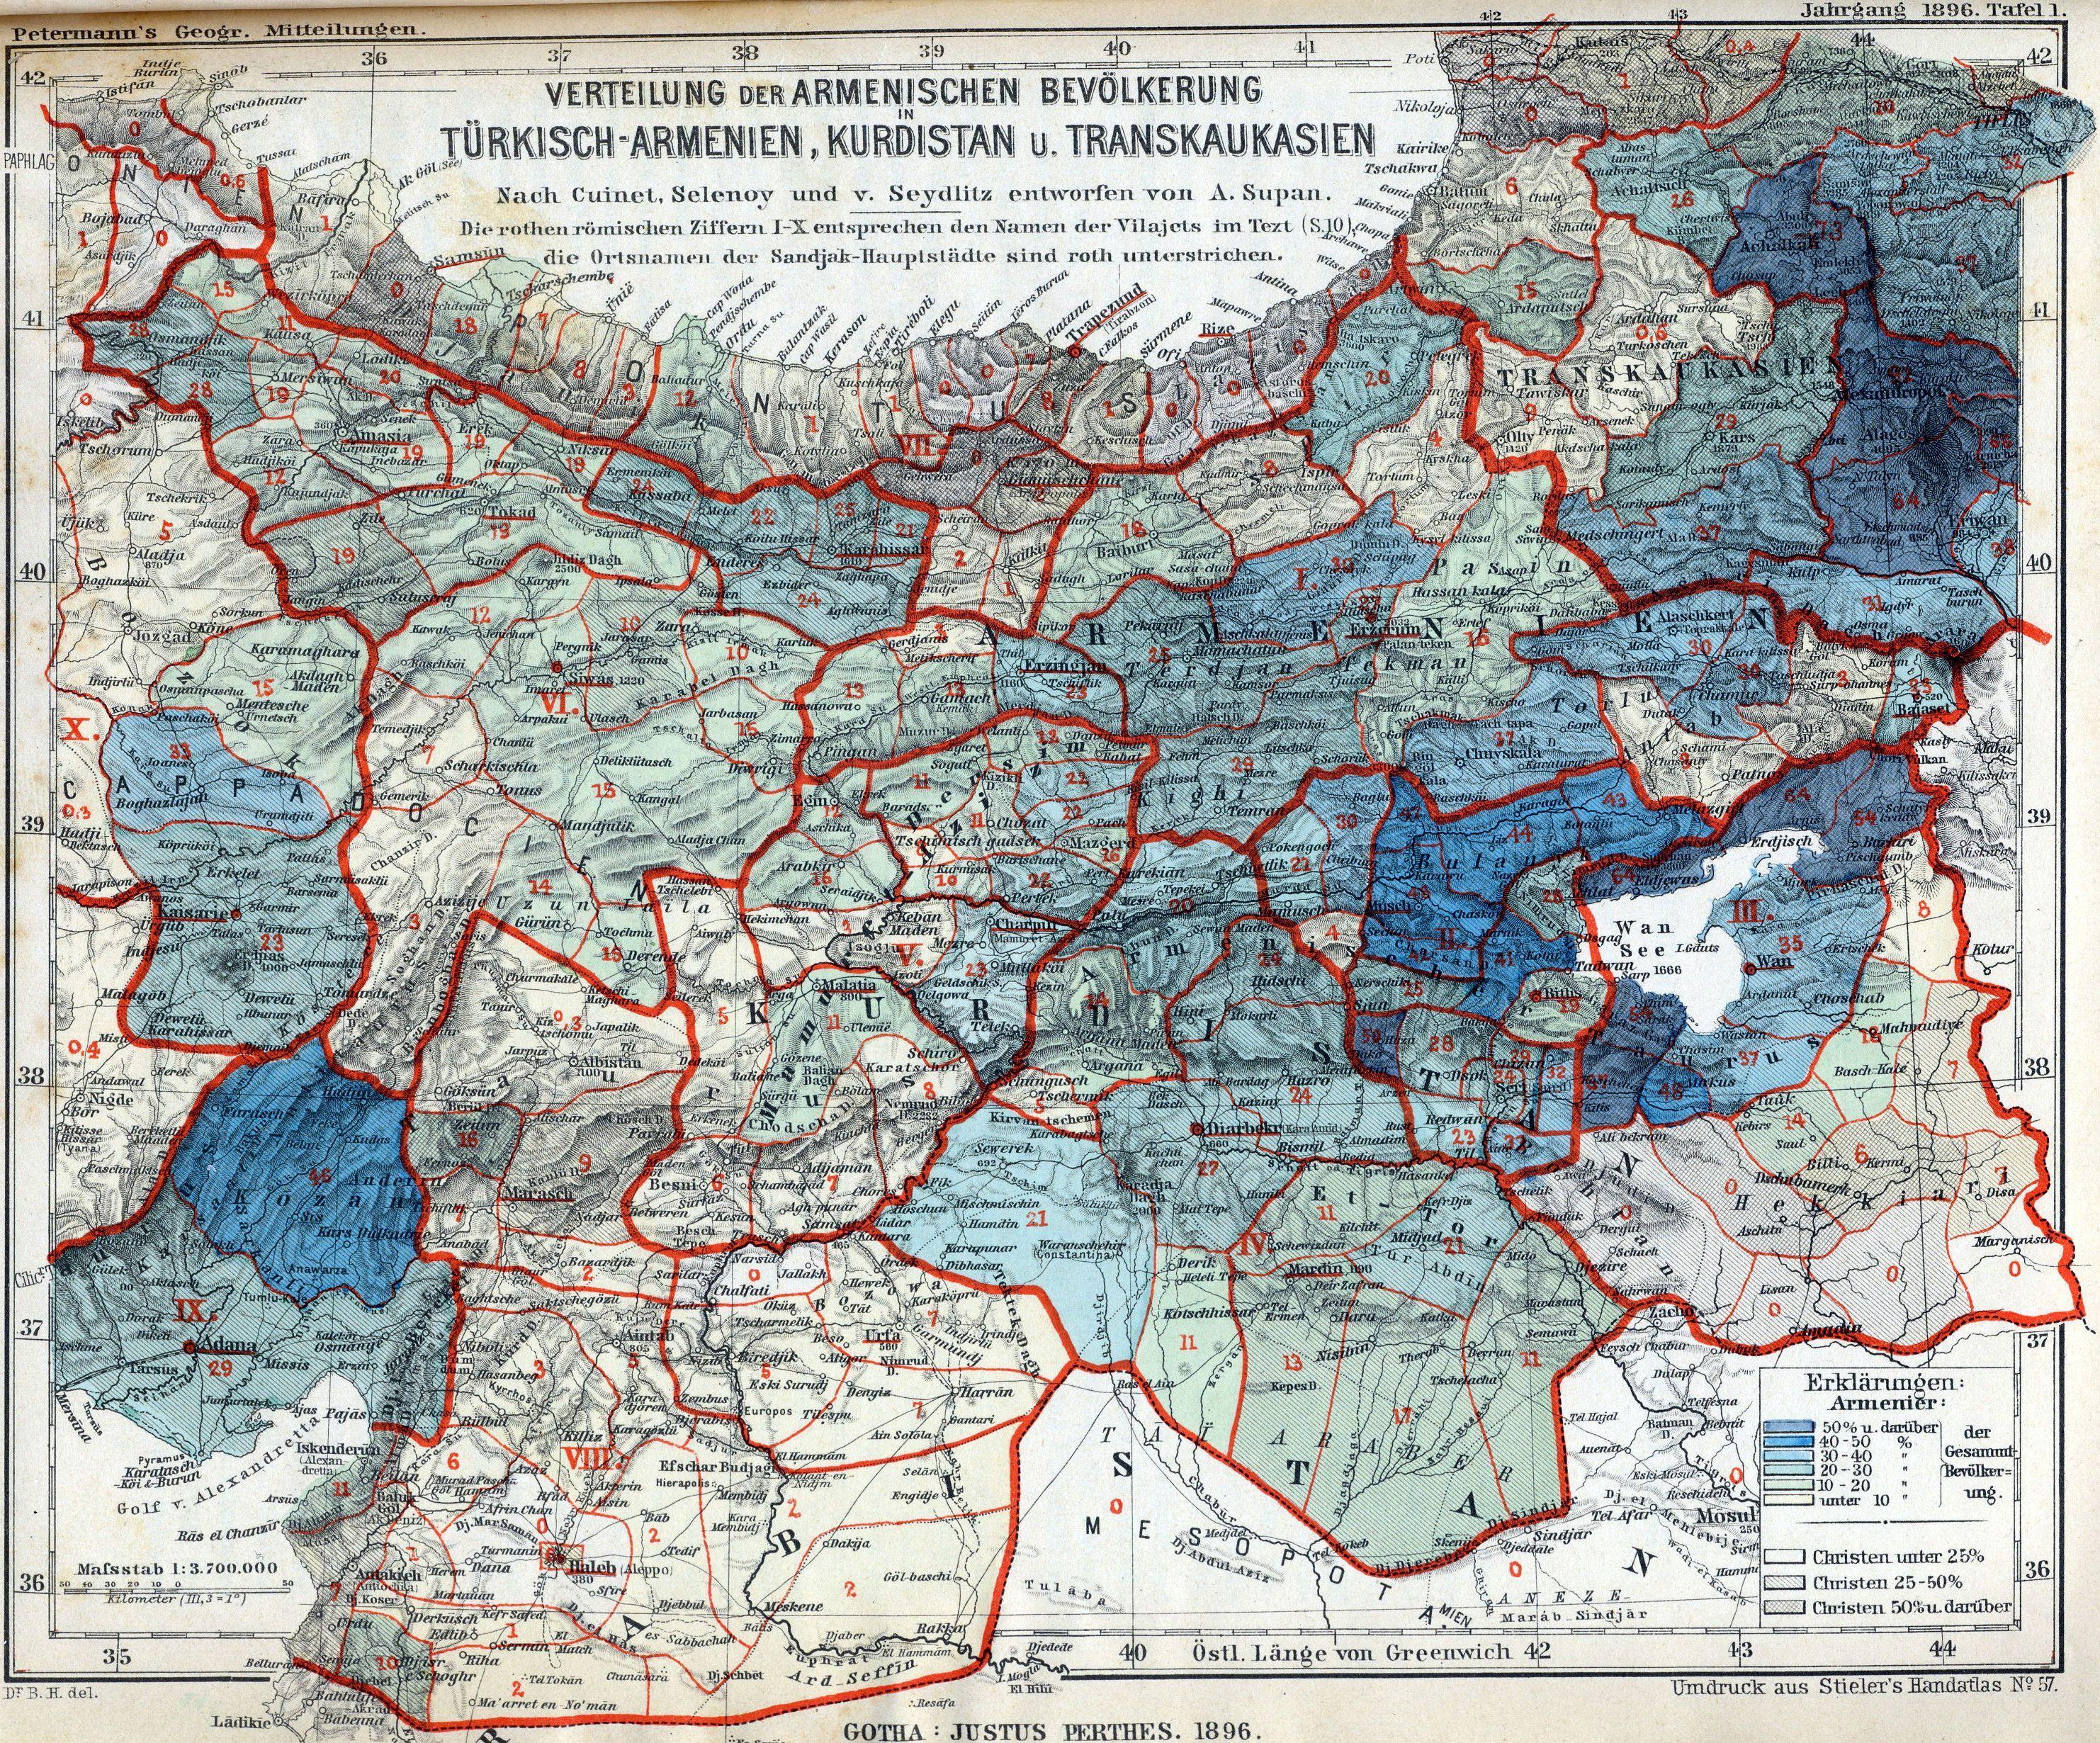 German map of Ottoman Turkish Armenian vilayets yr 1896 Malatya